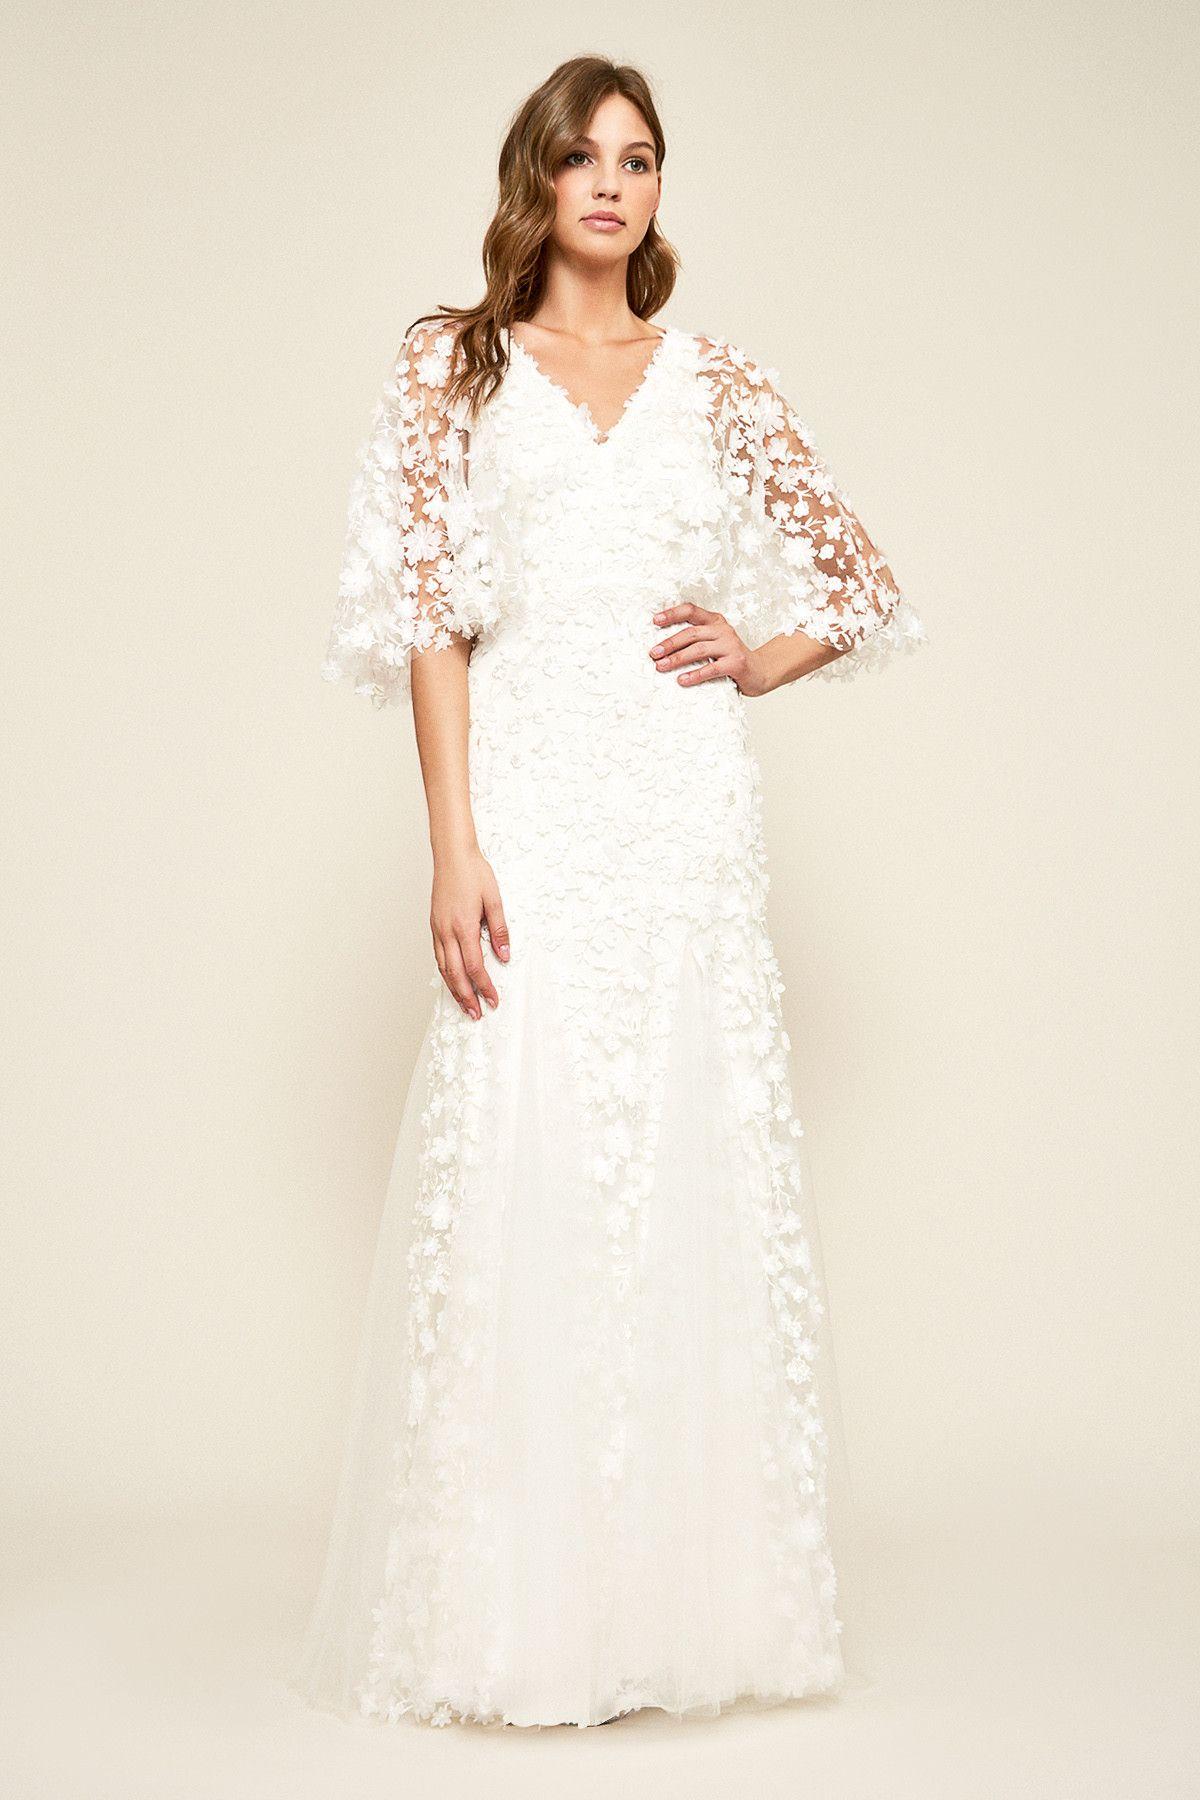 Wedding dresses tulsa  Tulsa Appliqué Gown  Tadashi Shoji  꽃드레스  Pinterest  Gowns